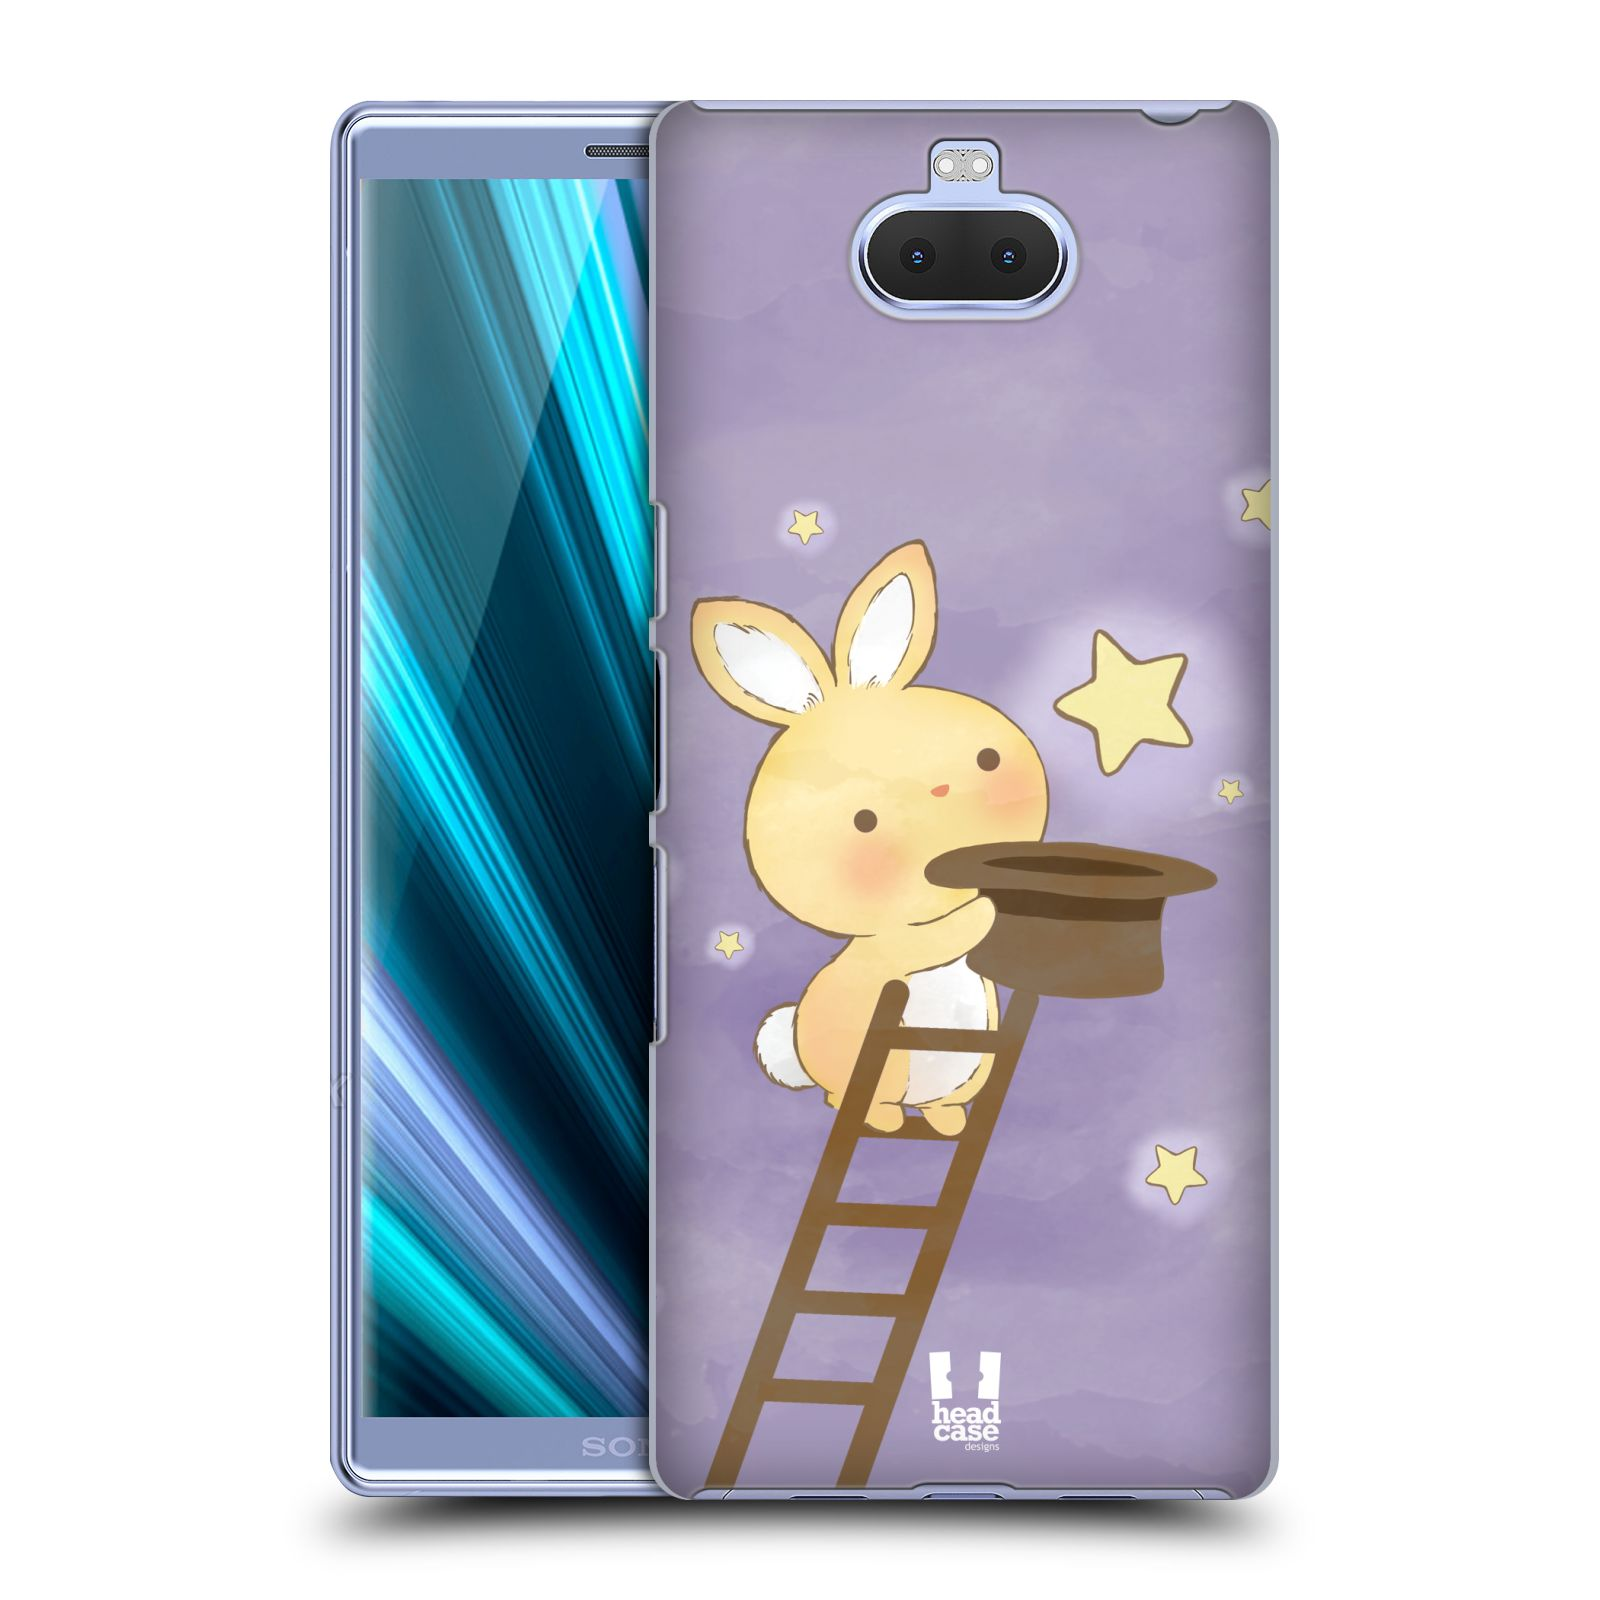 Pouzdro na mobil Sony Xperia 10 - Head Case - vzor králíček a hvězdy fialová